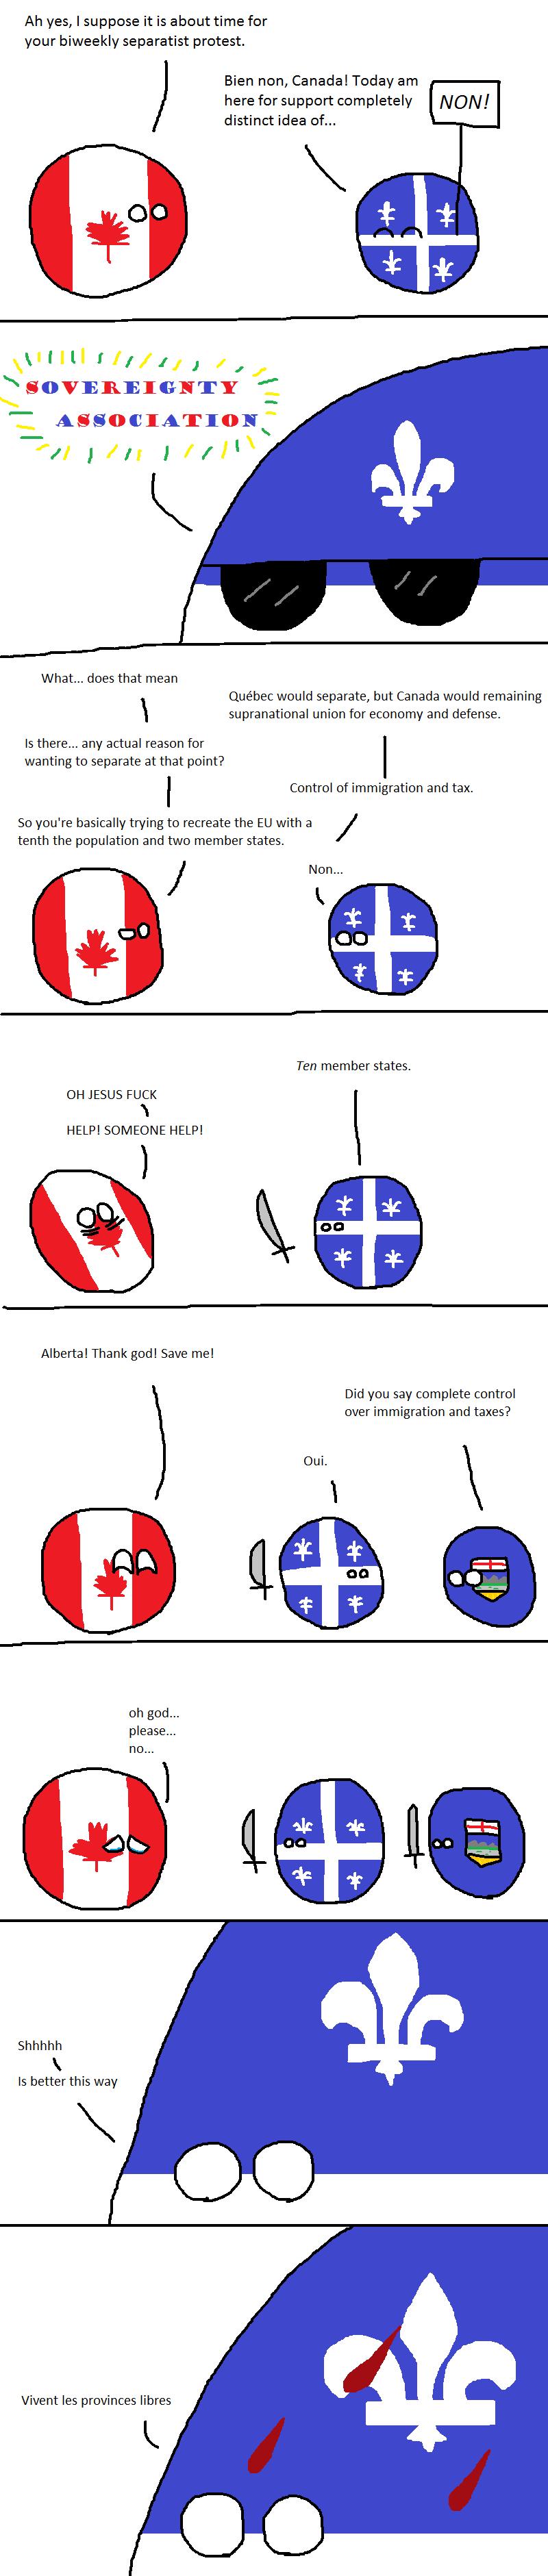 Sovereignty-Association